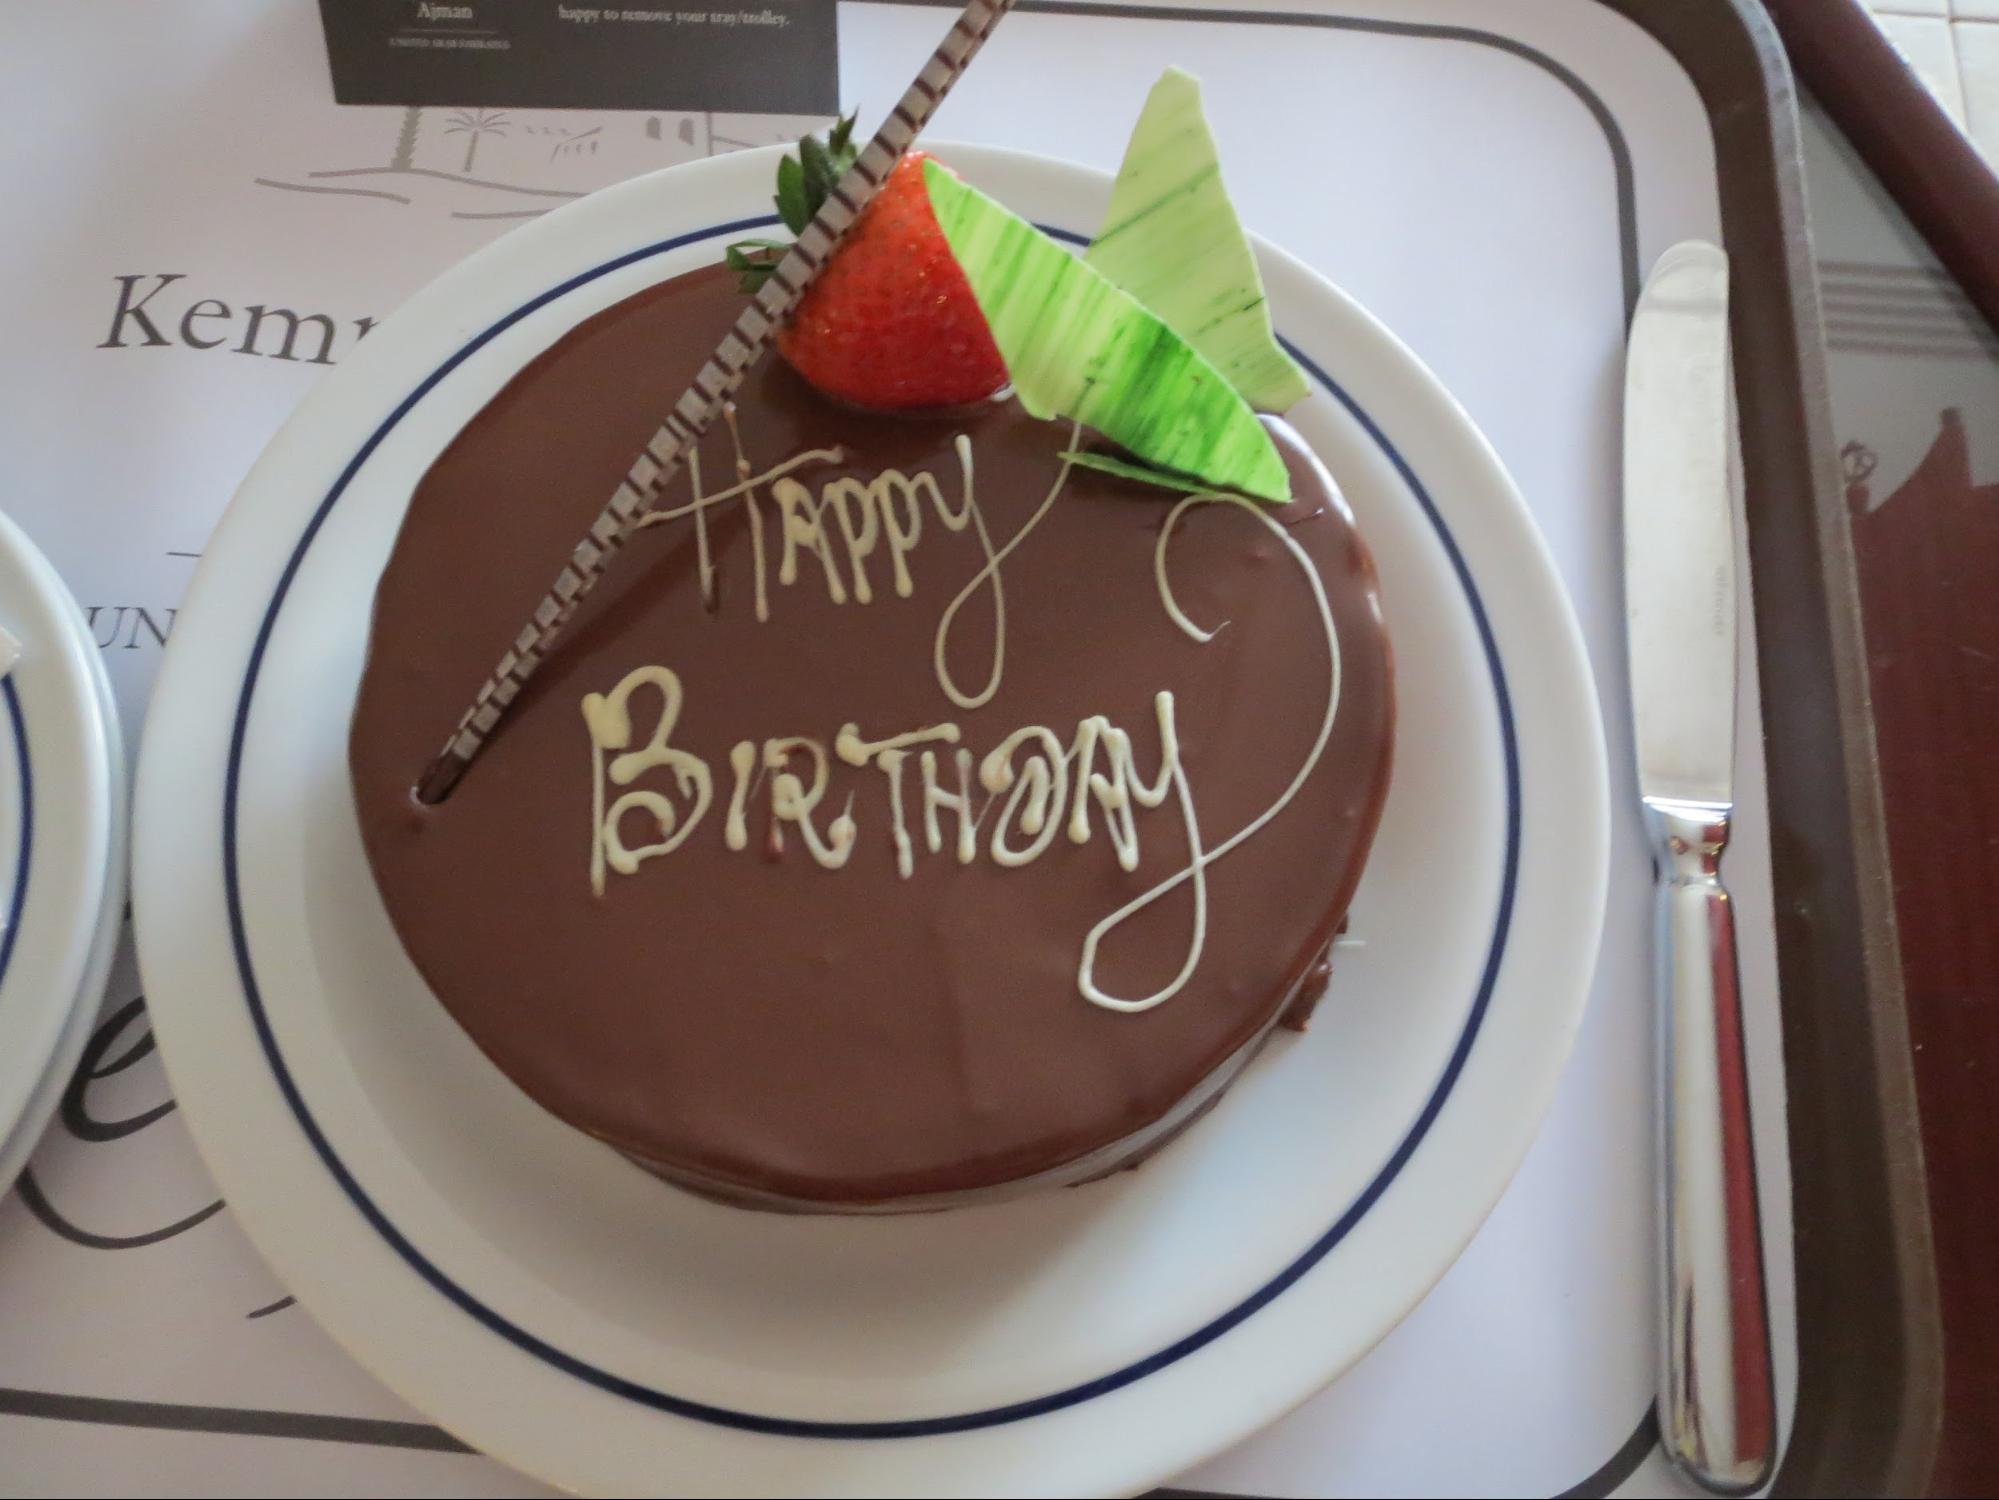 Kempinski Hotel, Ajman Review - Birthday Surprise Chocolate Cake